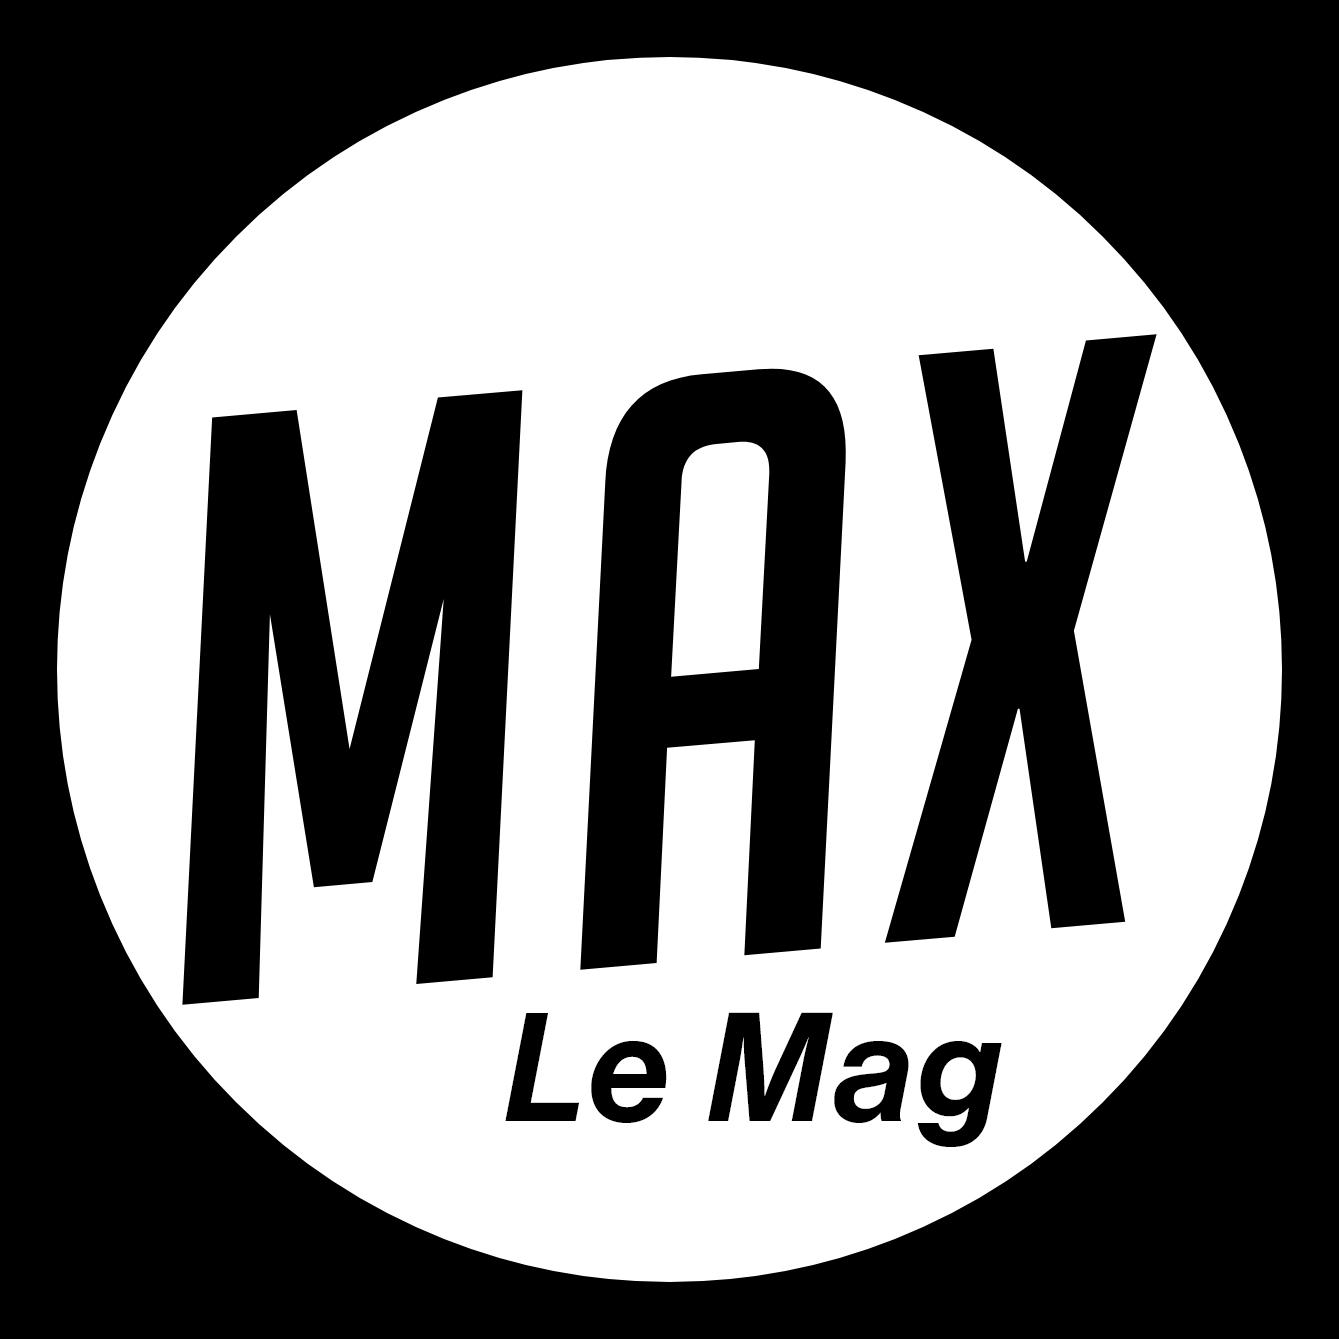 Le Magazine des Max